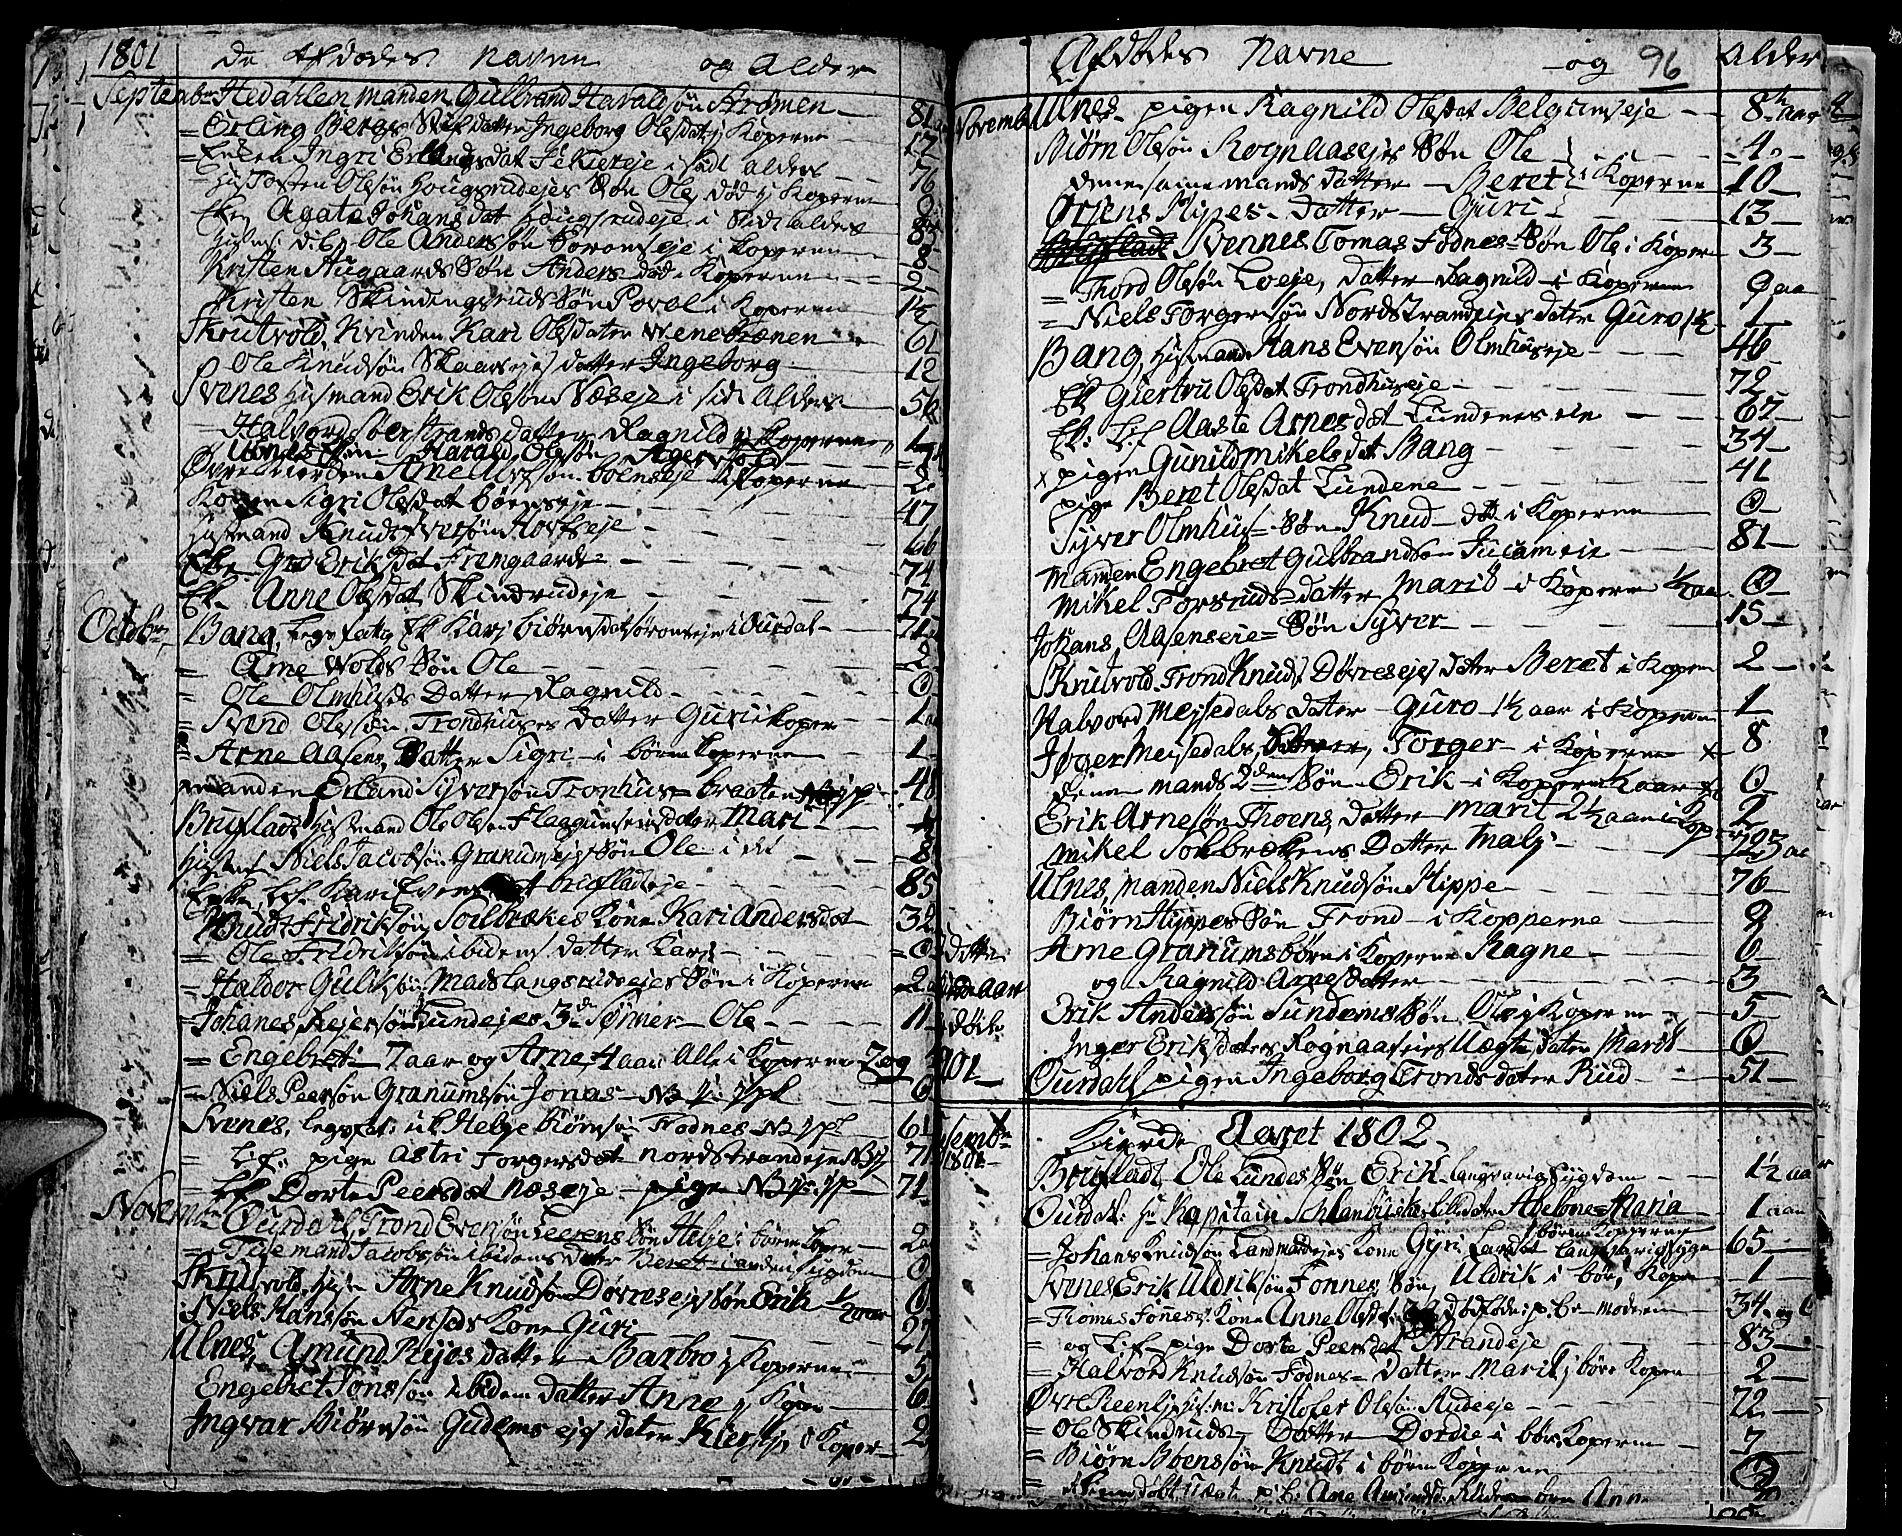 SAH, Aurdal prestekontor, Ministerialbok nr. 7, 1800-1808, s. 96